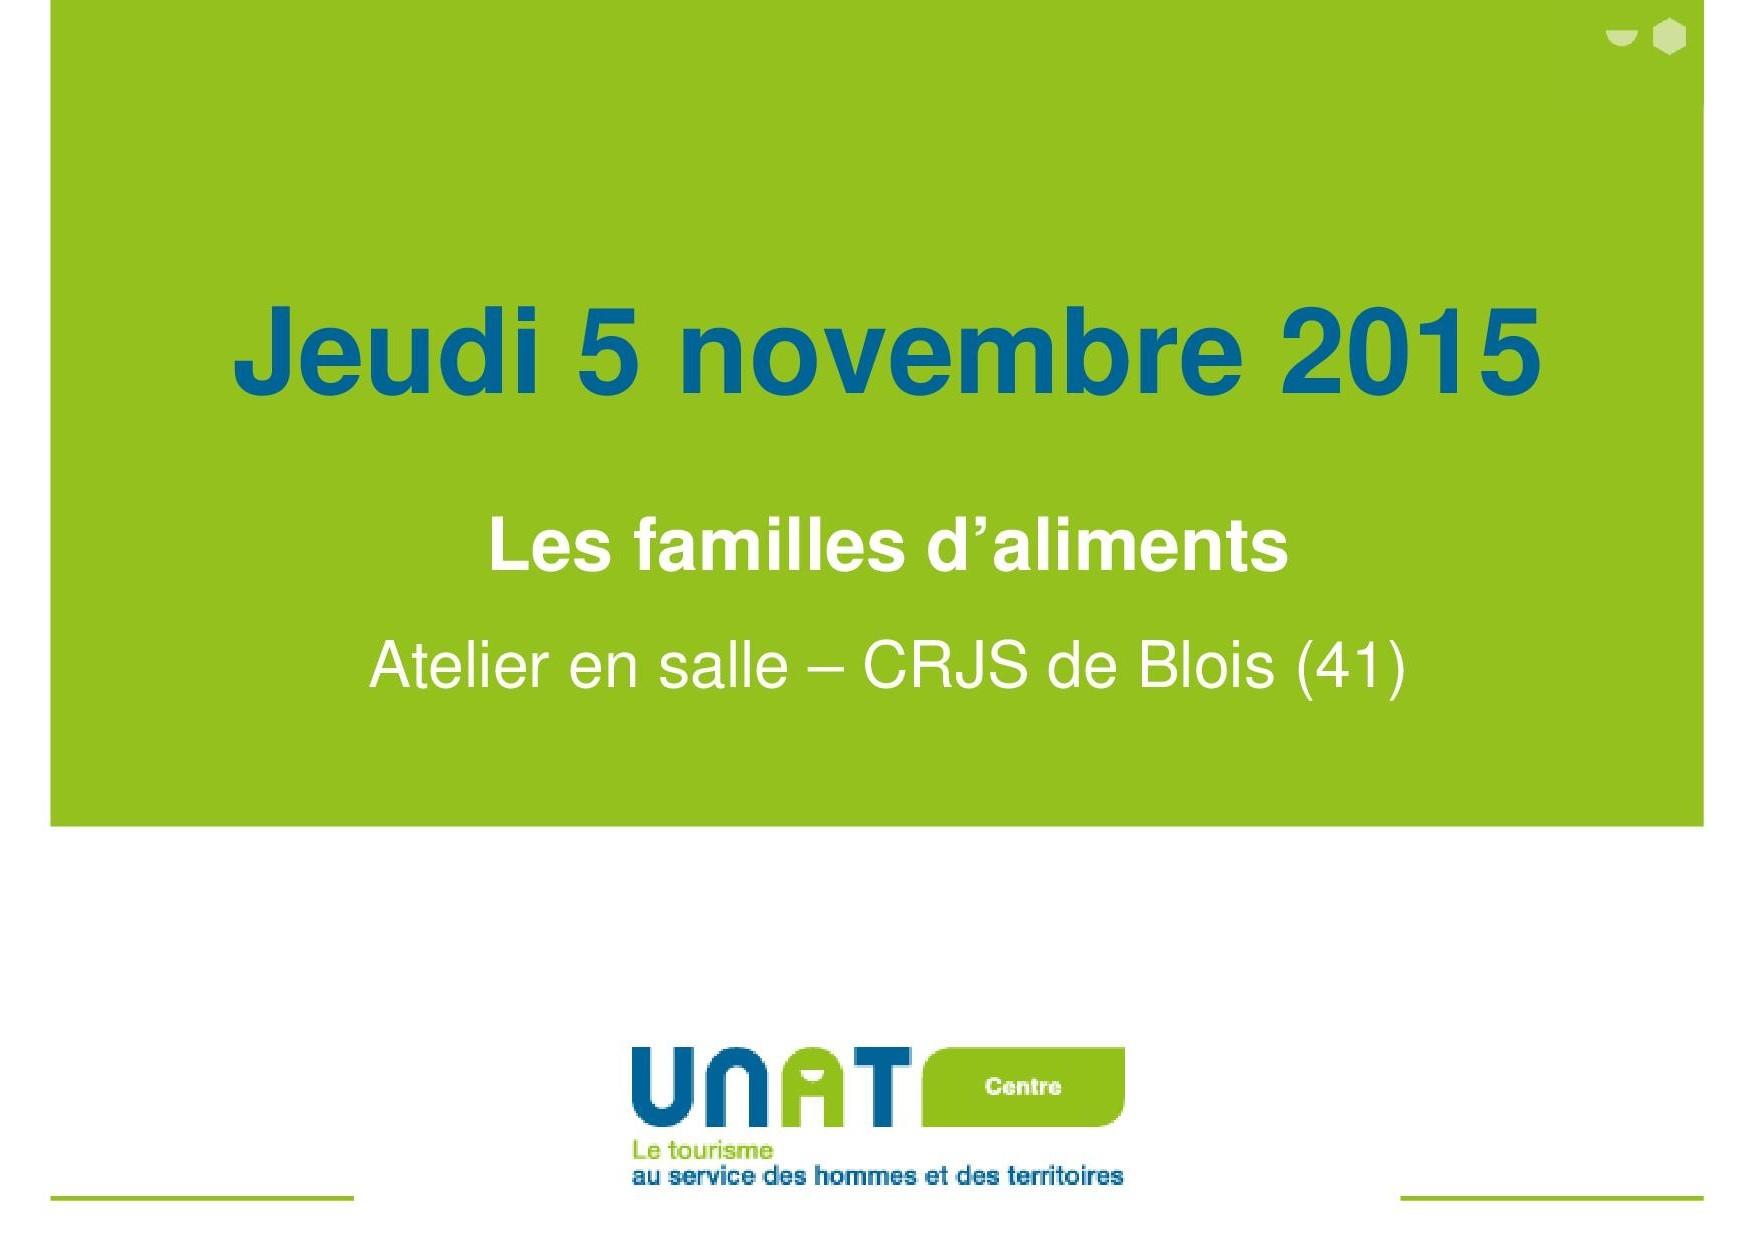 © UNAT Centre